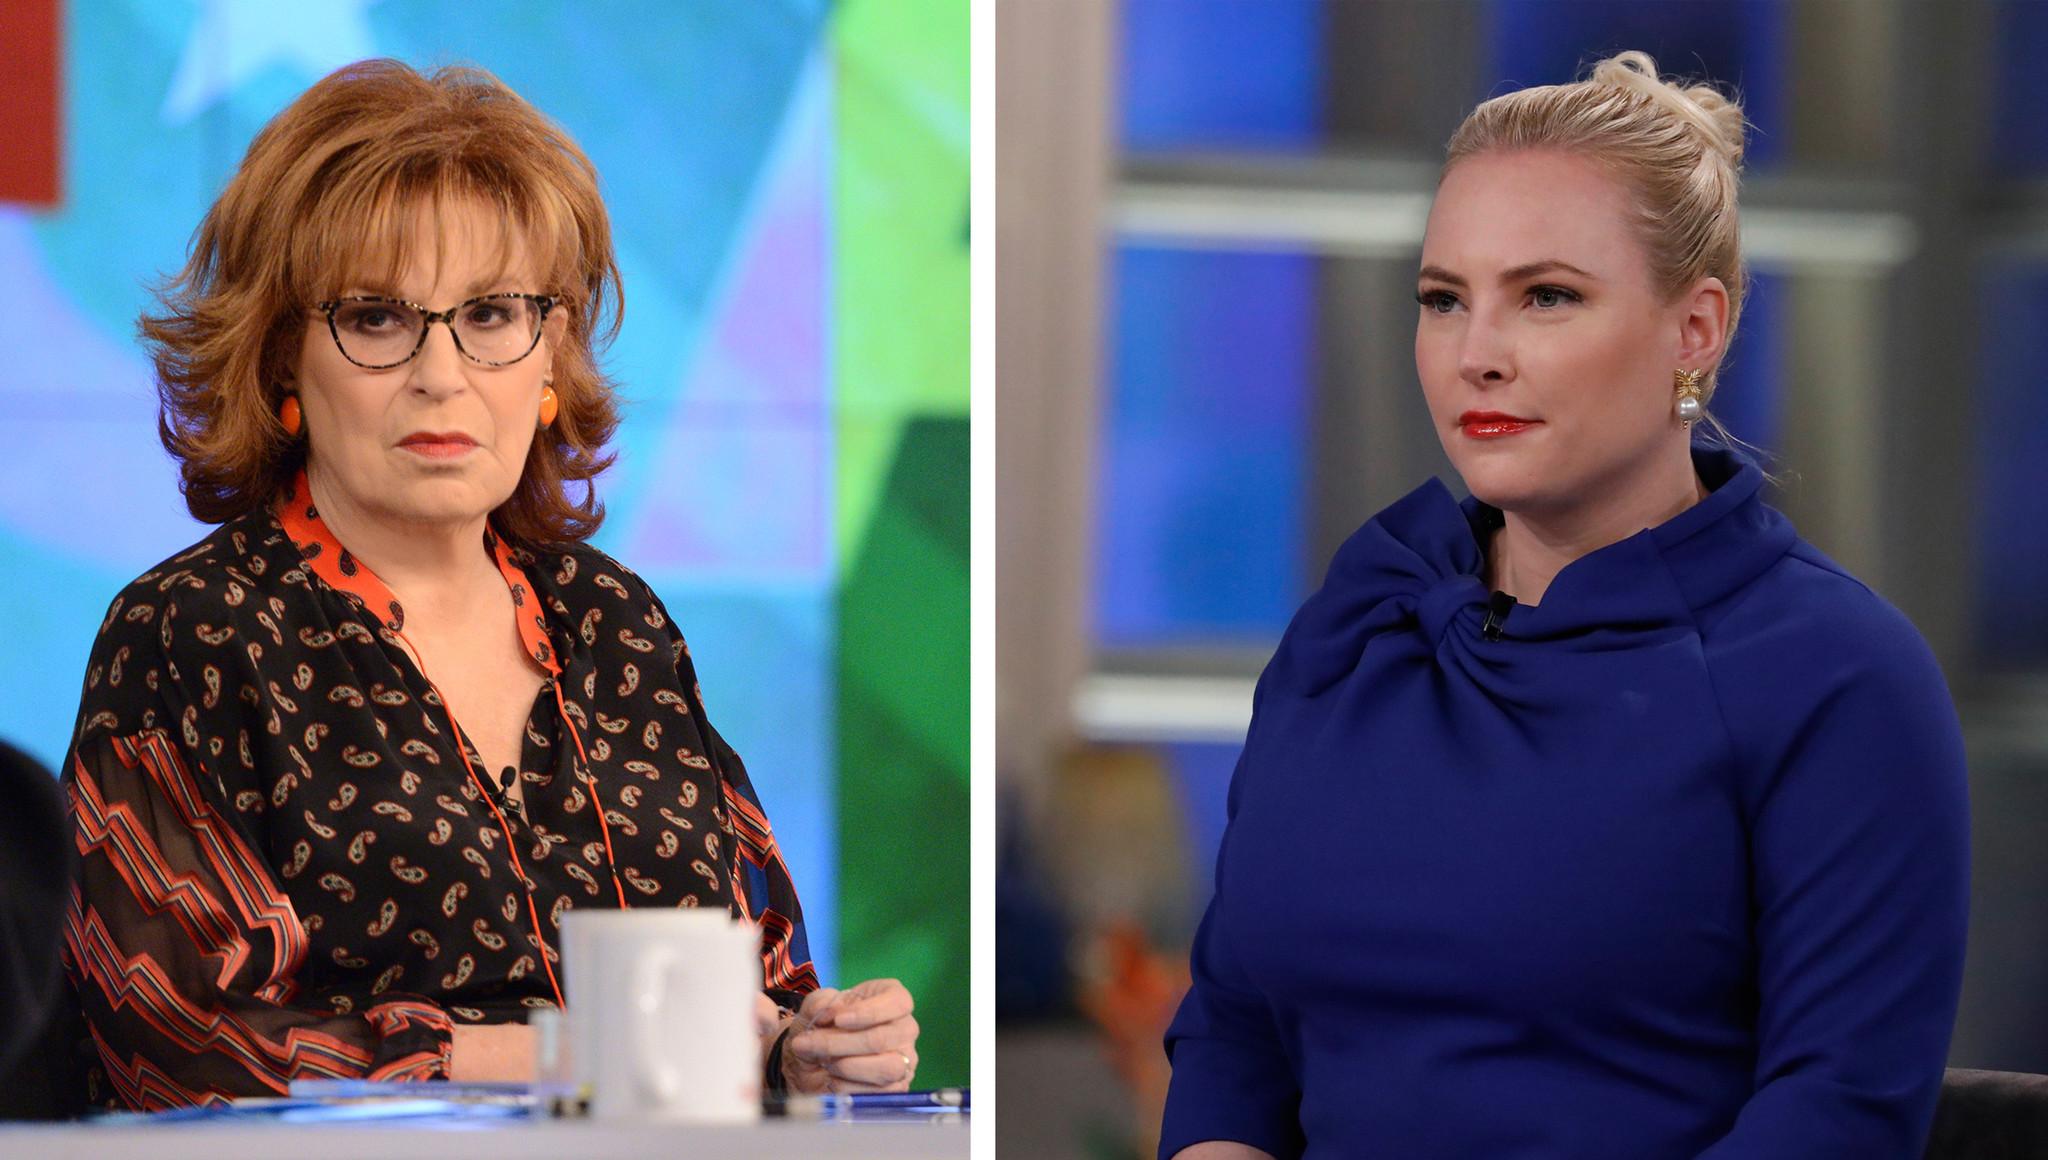 SEE IT: 'View' host Joy Behar shuts down Meghan McCain with MAGA burn